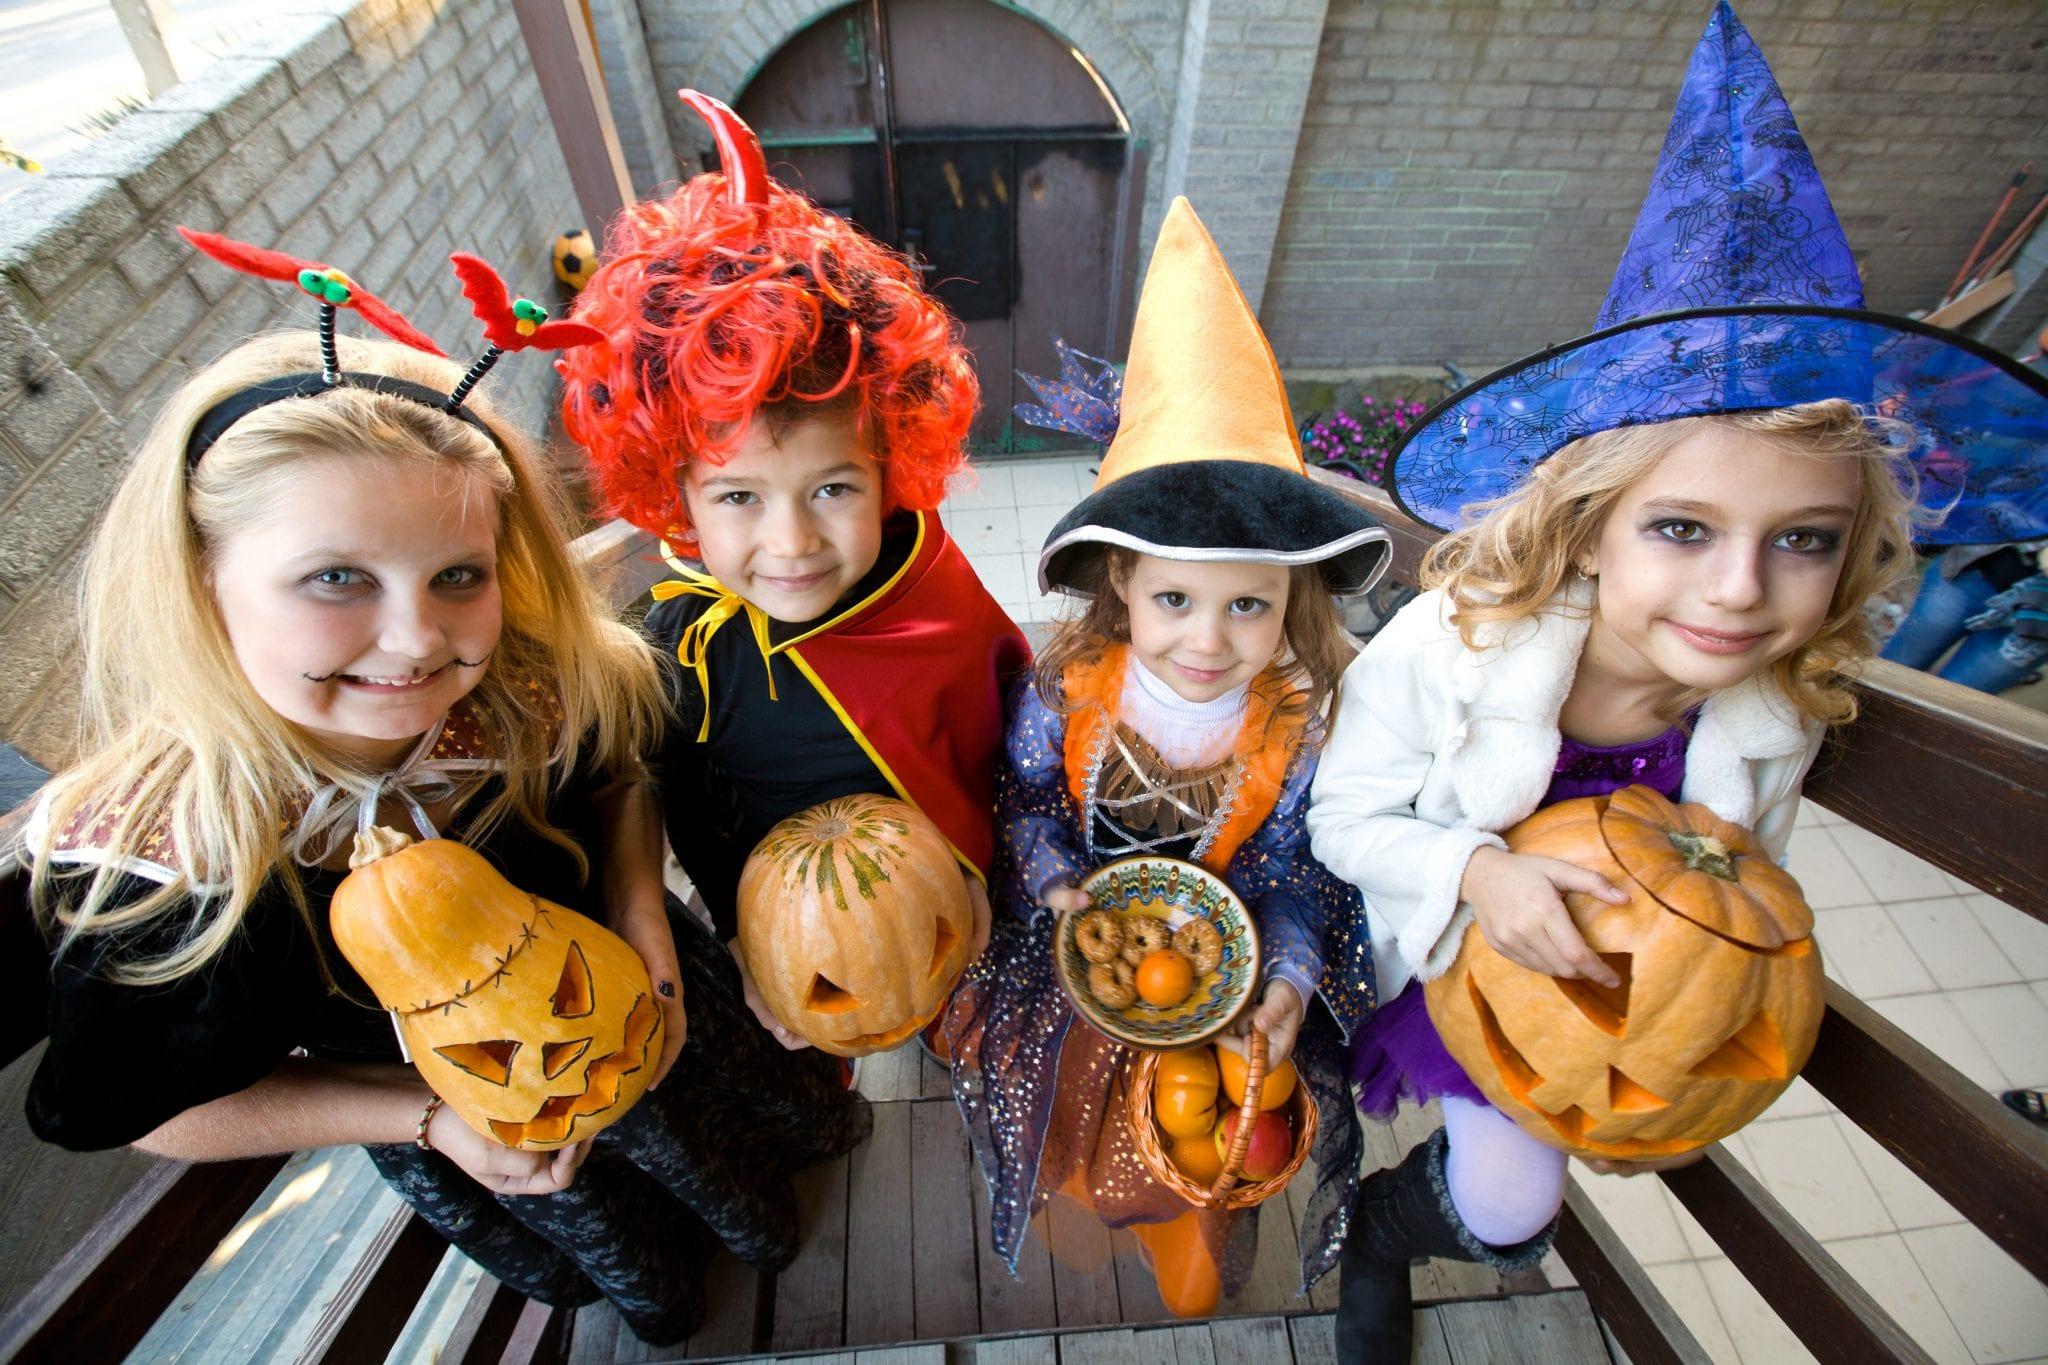 Como é que é celebrado o Halloween no México? E na Irlanda? E nos Estados Unidos da América?